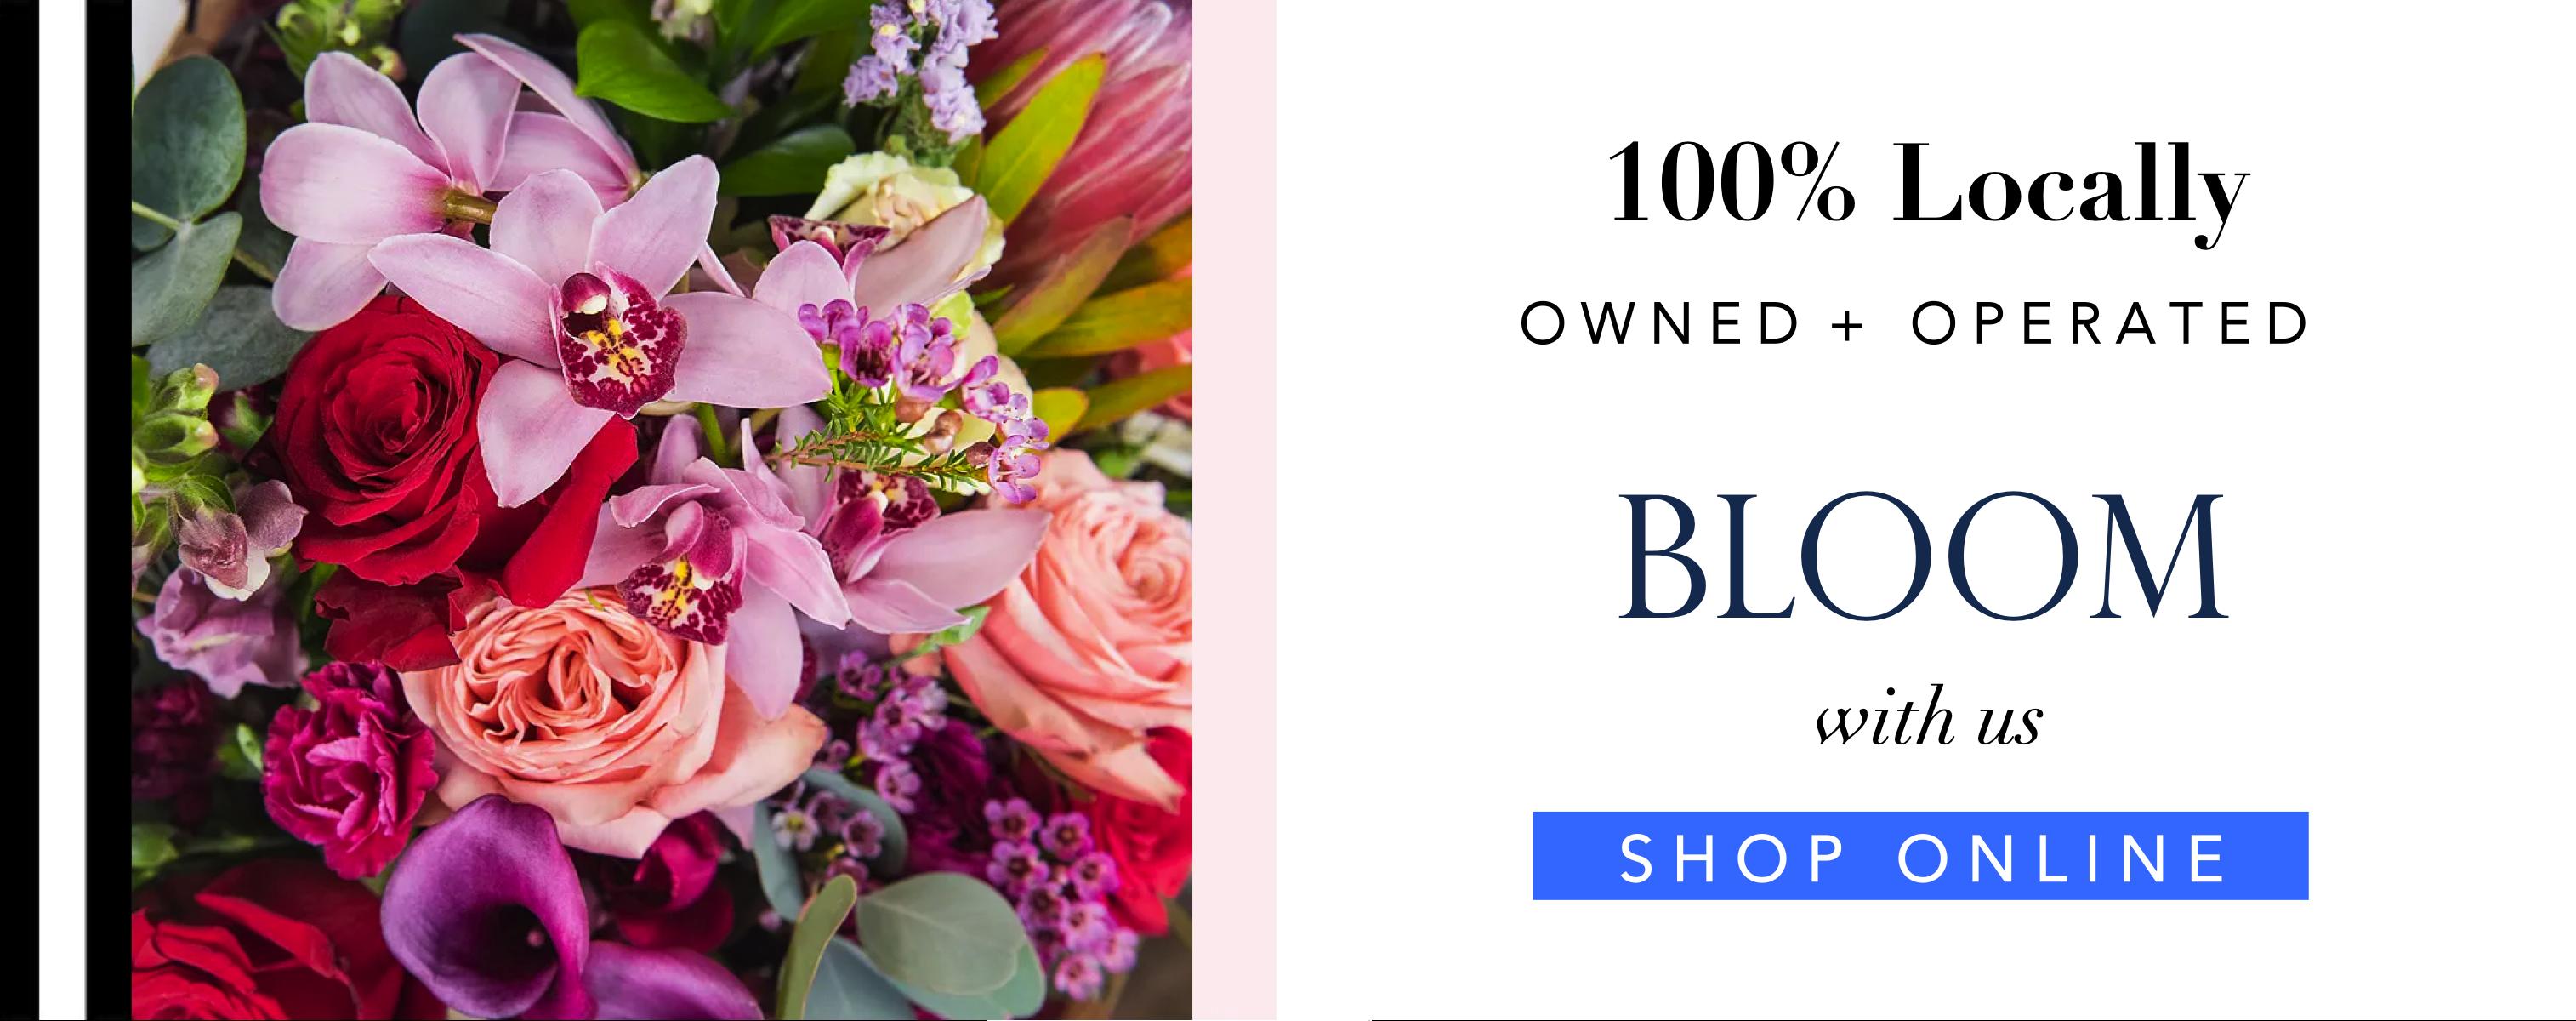 0-79912-angies-floral-designs-0-1-bridal-el-paso-florist-79912-flowershop-flower-delivery-el-paso-luxury-flowers-angies-floral-el-paso-florist-79912-.png